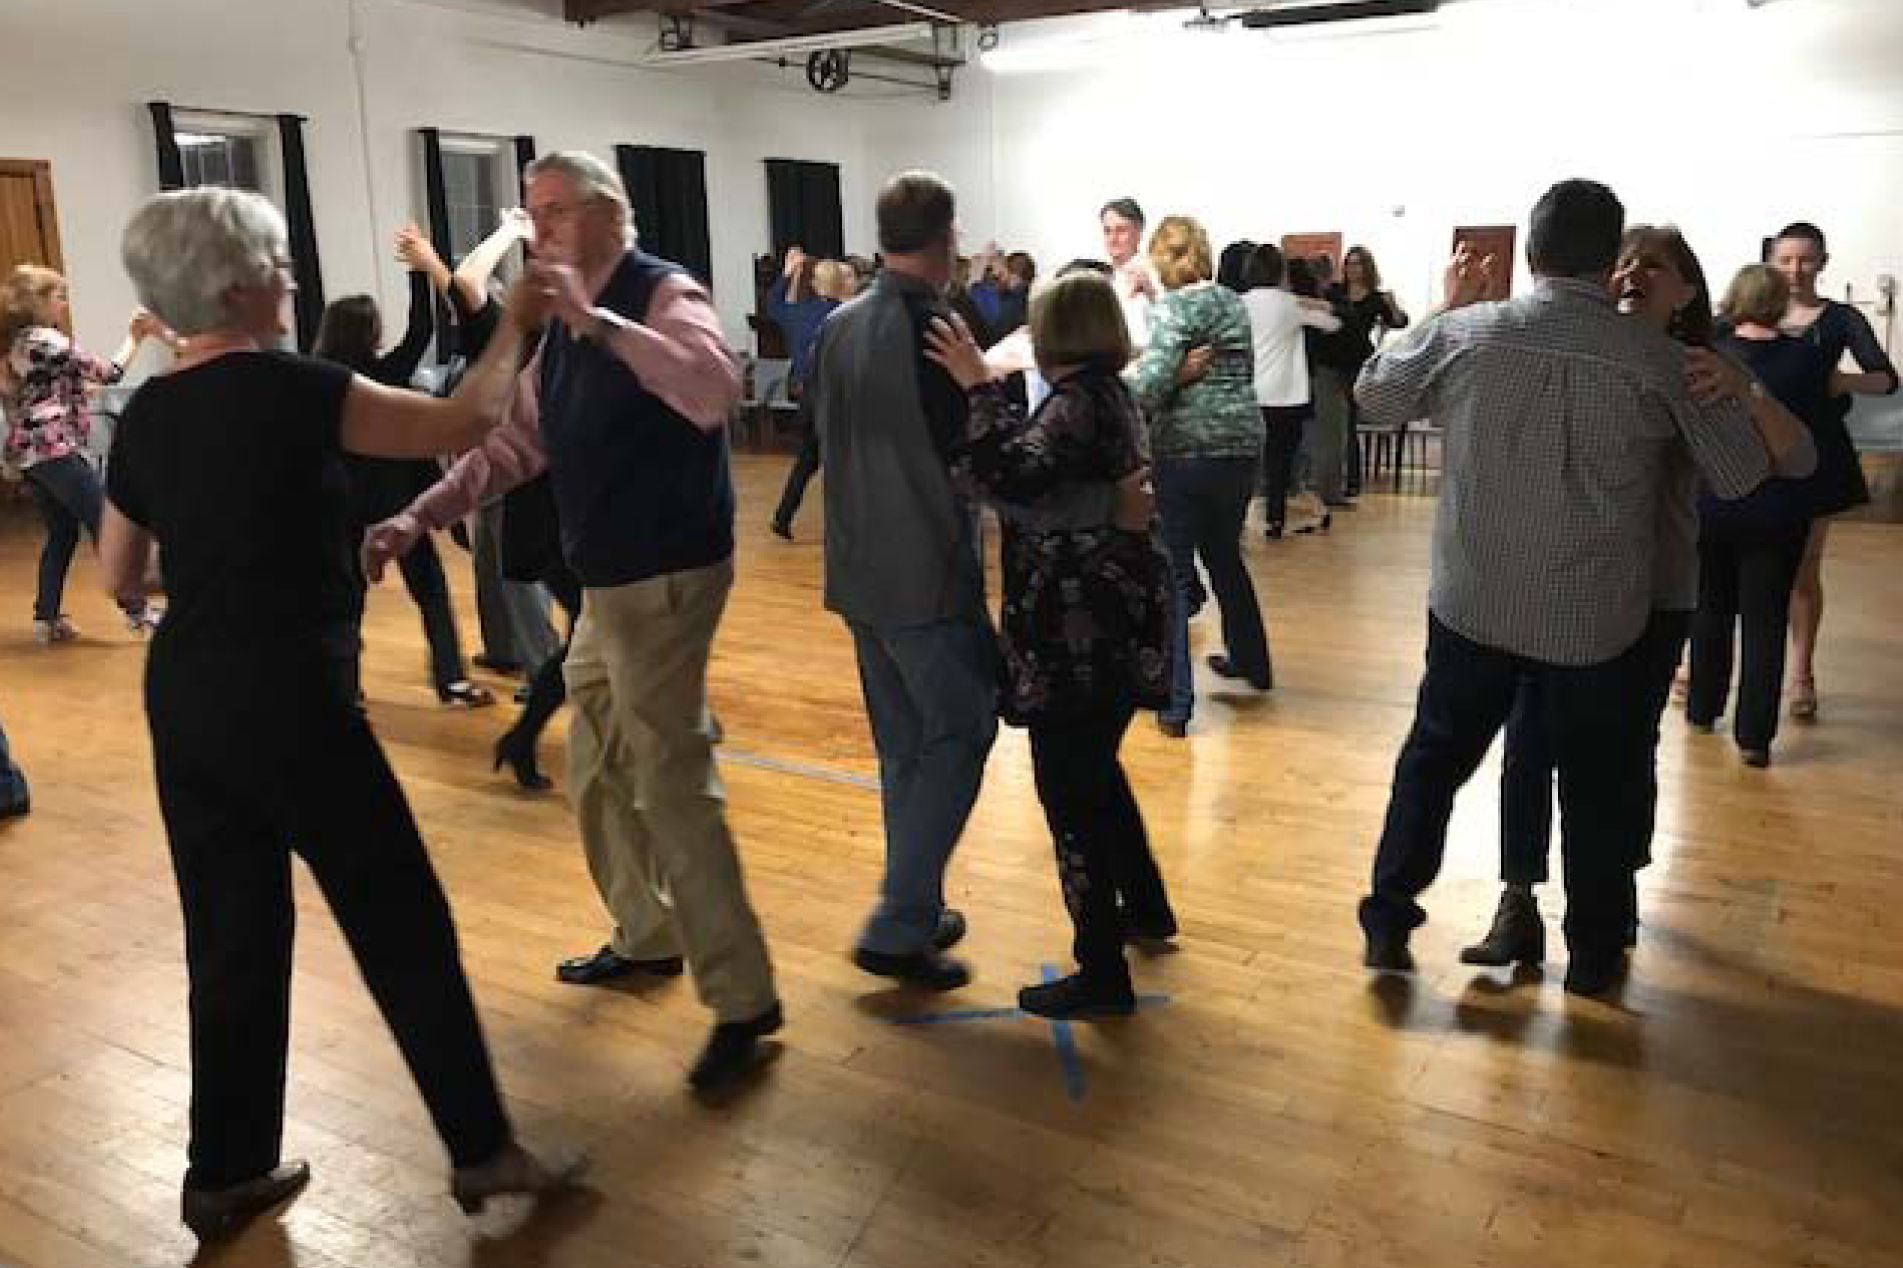 4-12-18 - Socail Dance.jpg